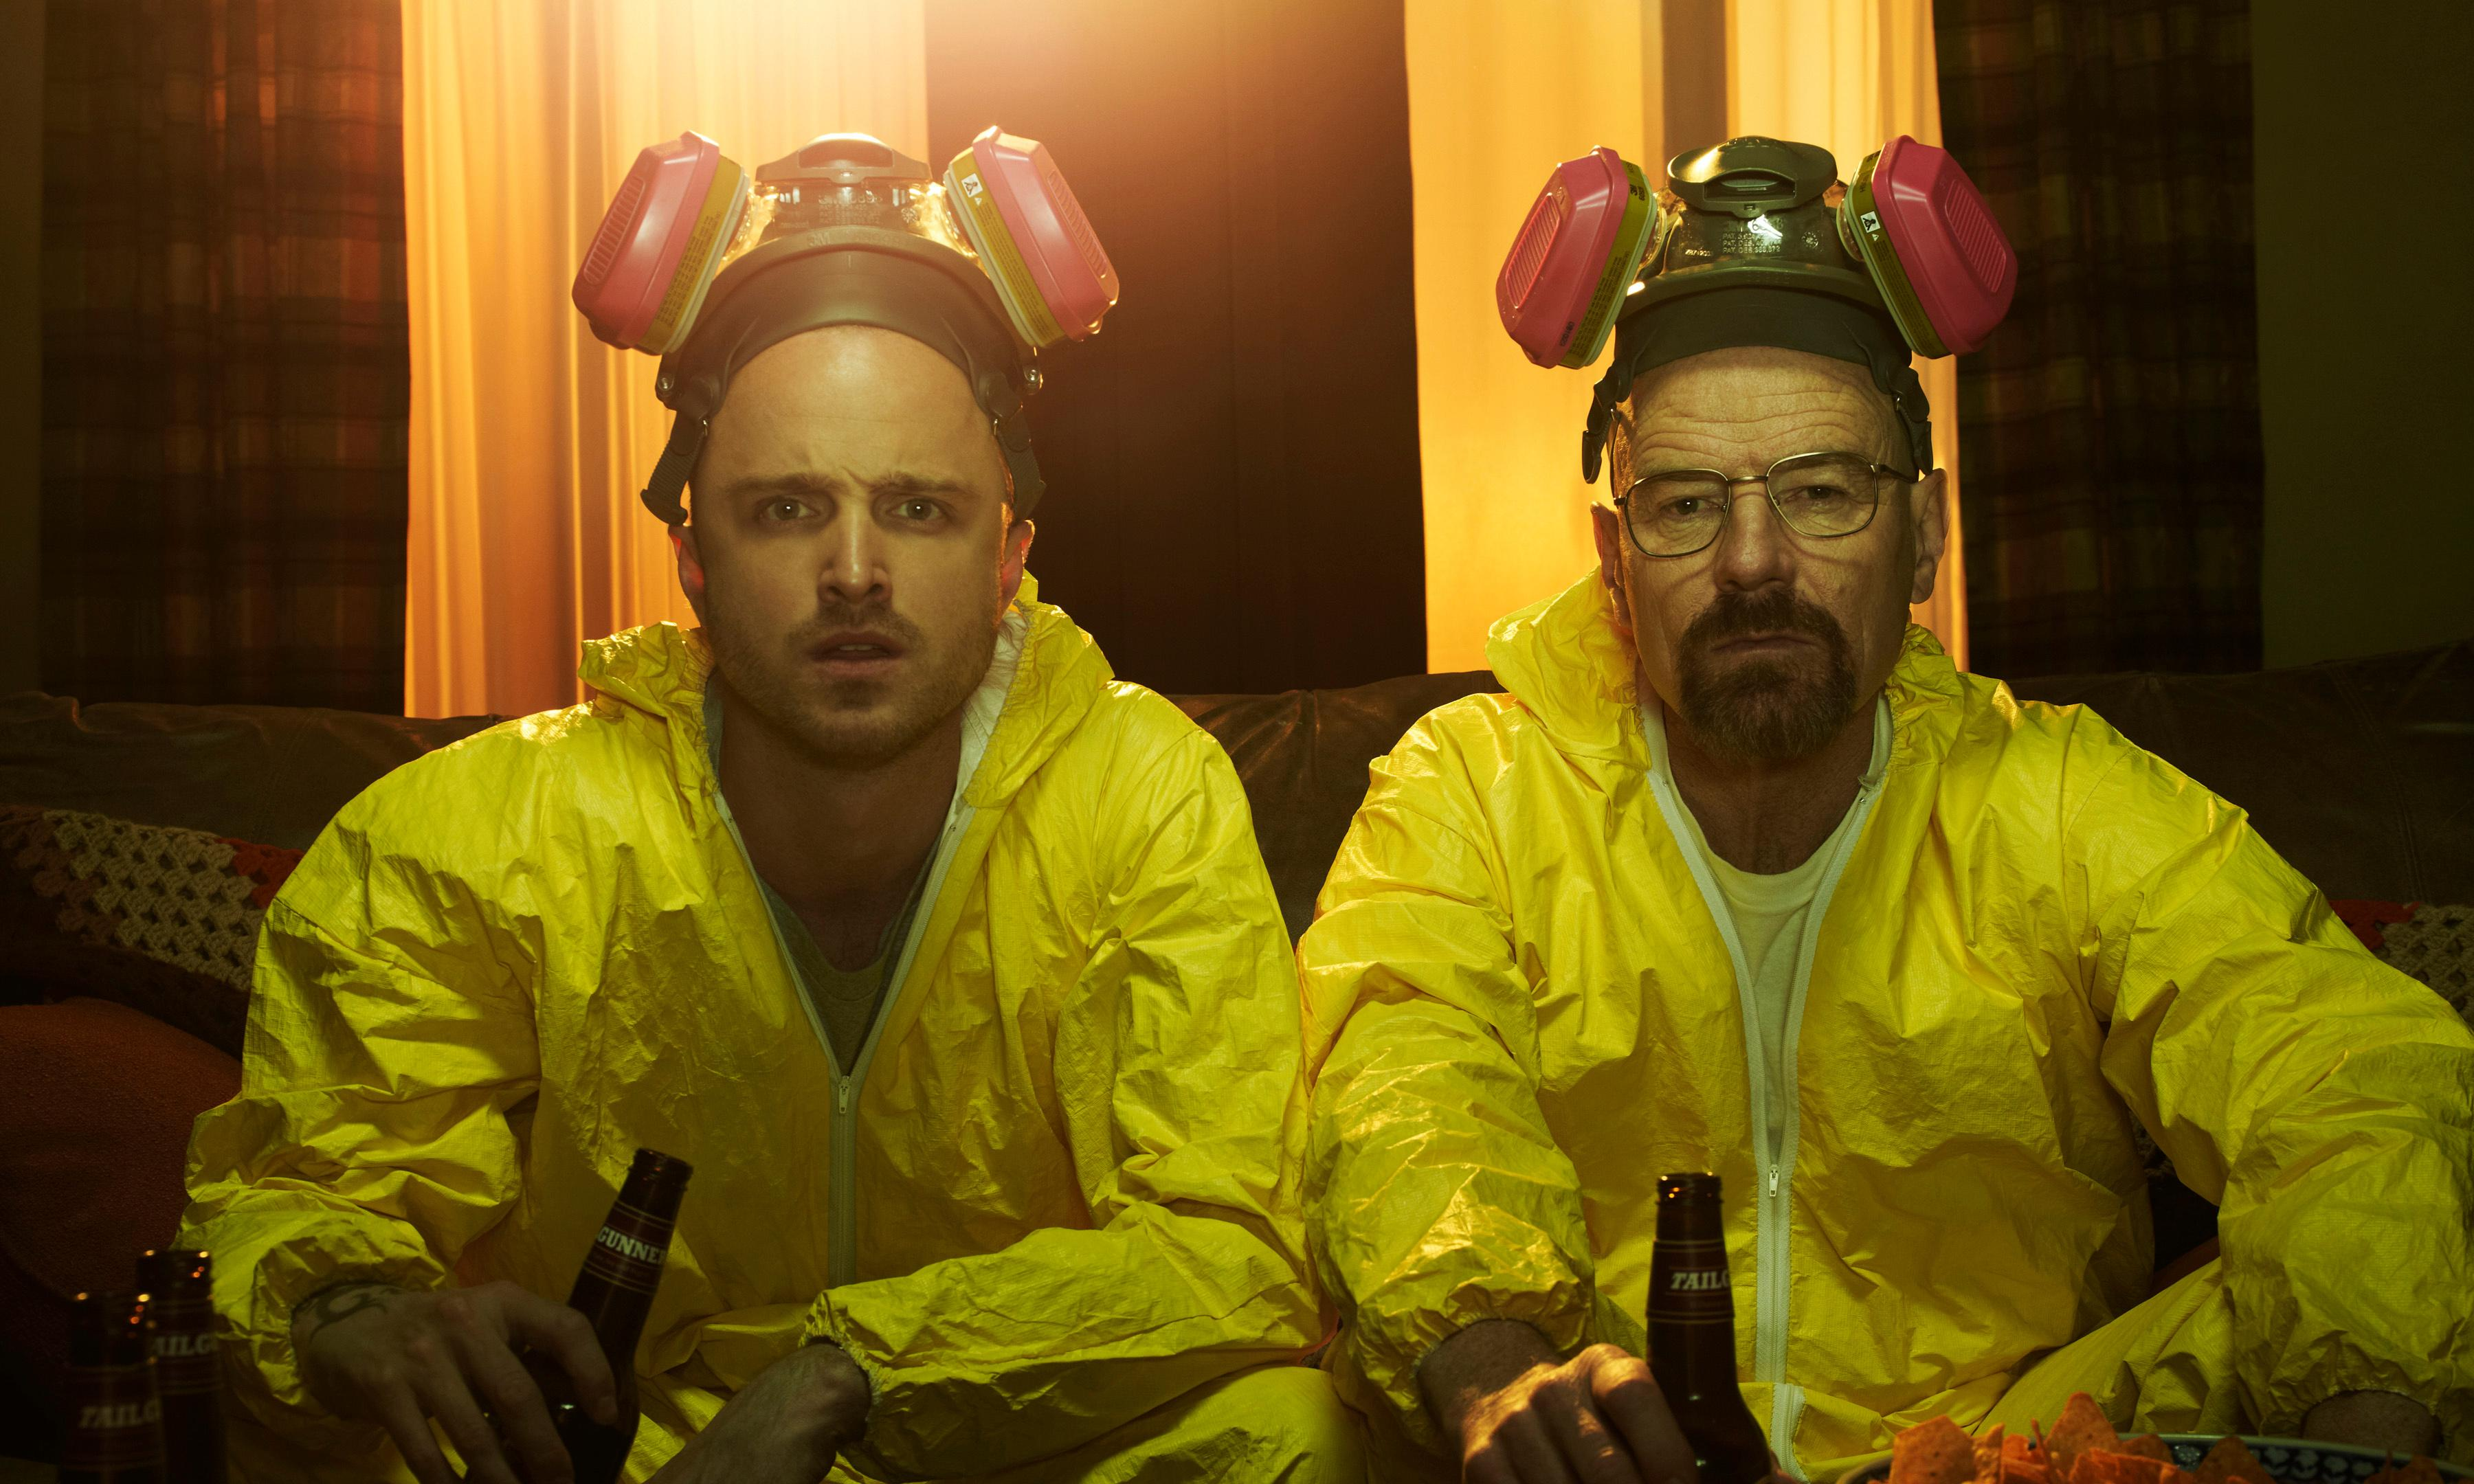 'Breaking Bad' Movie Coming to Netflix in October